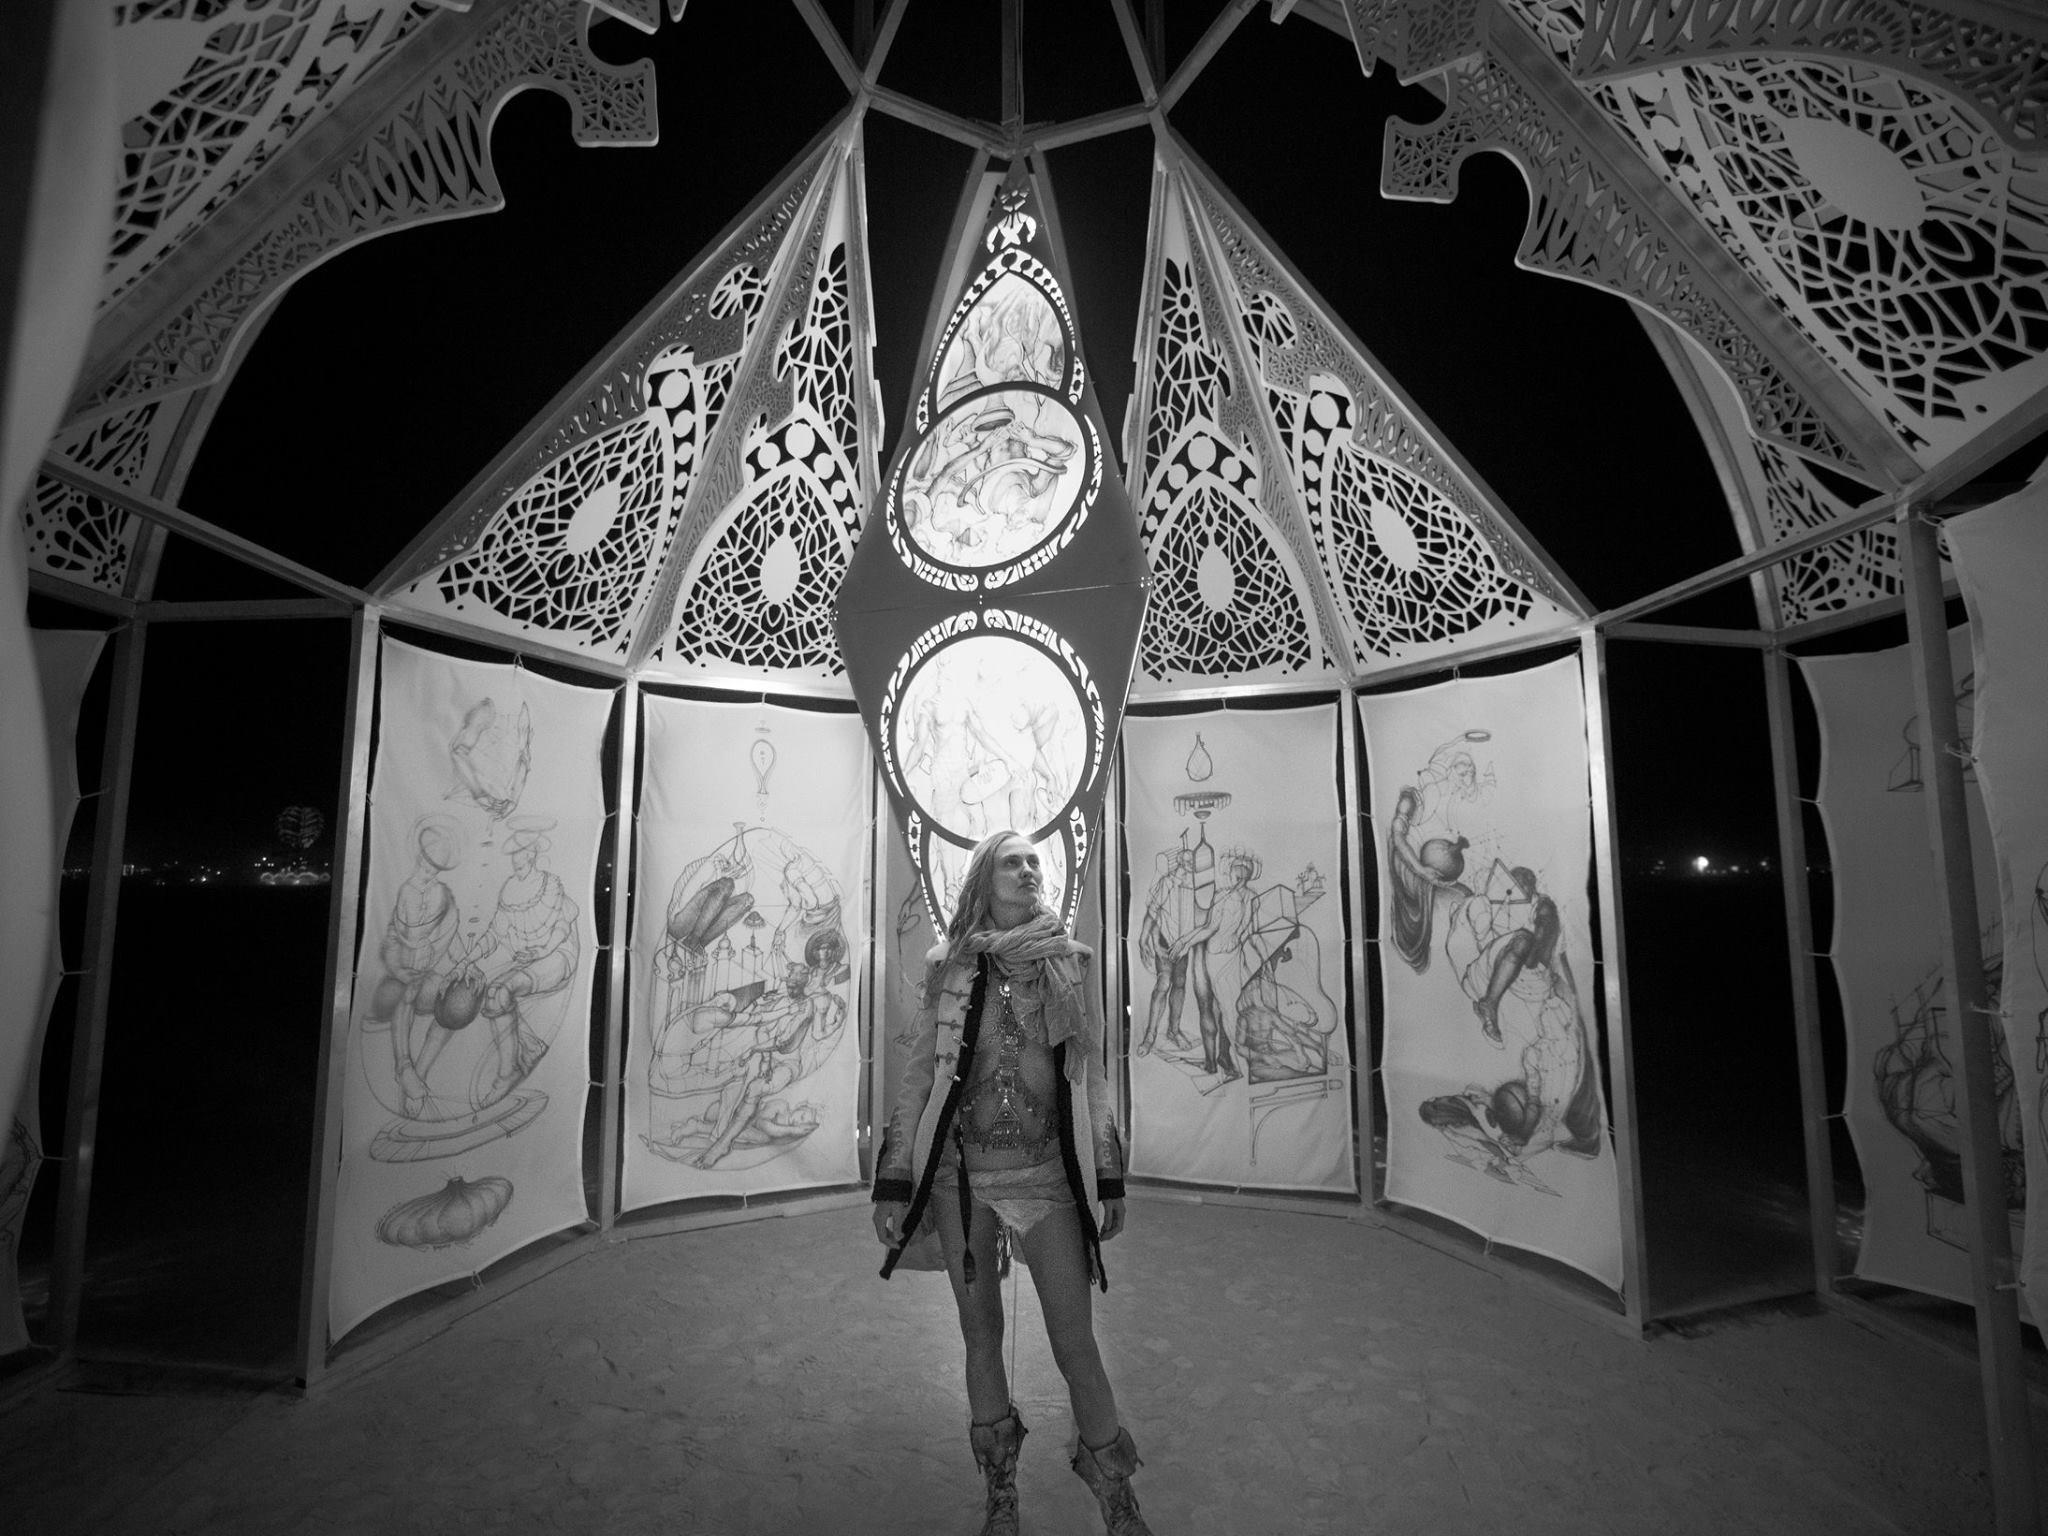 maria kreyn - chapel of dancing shadows 4. jpg